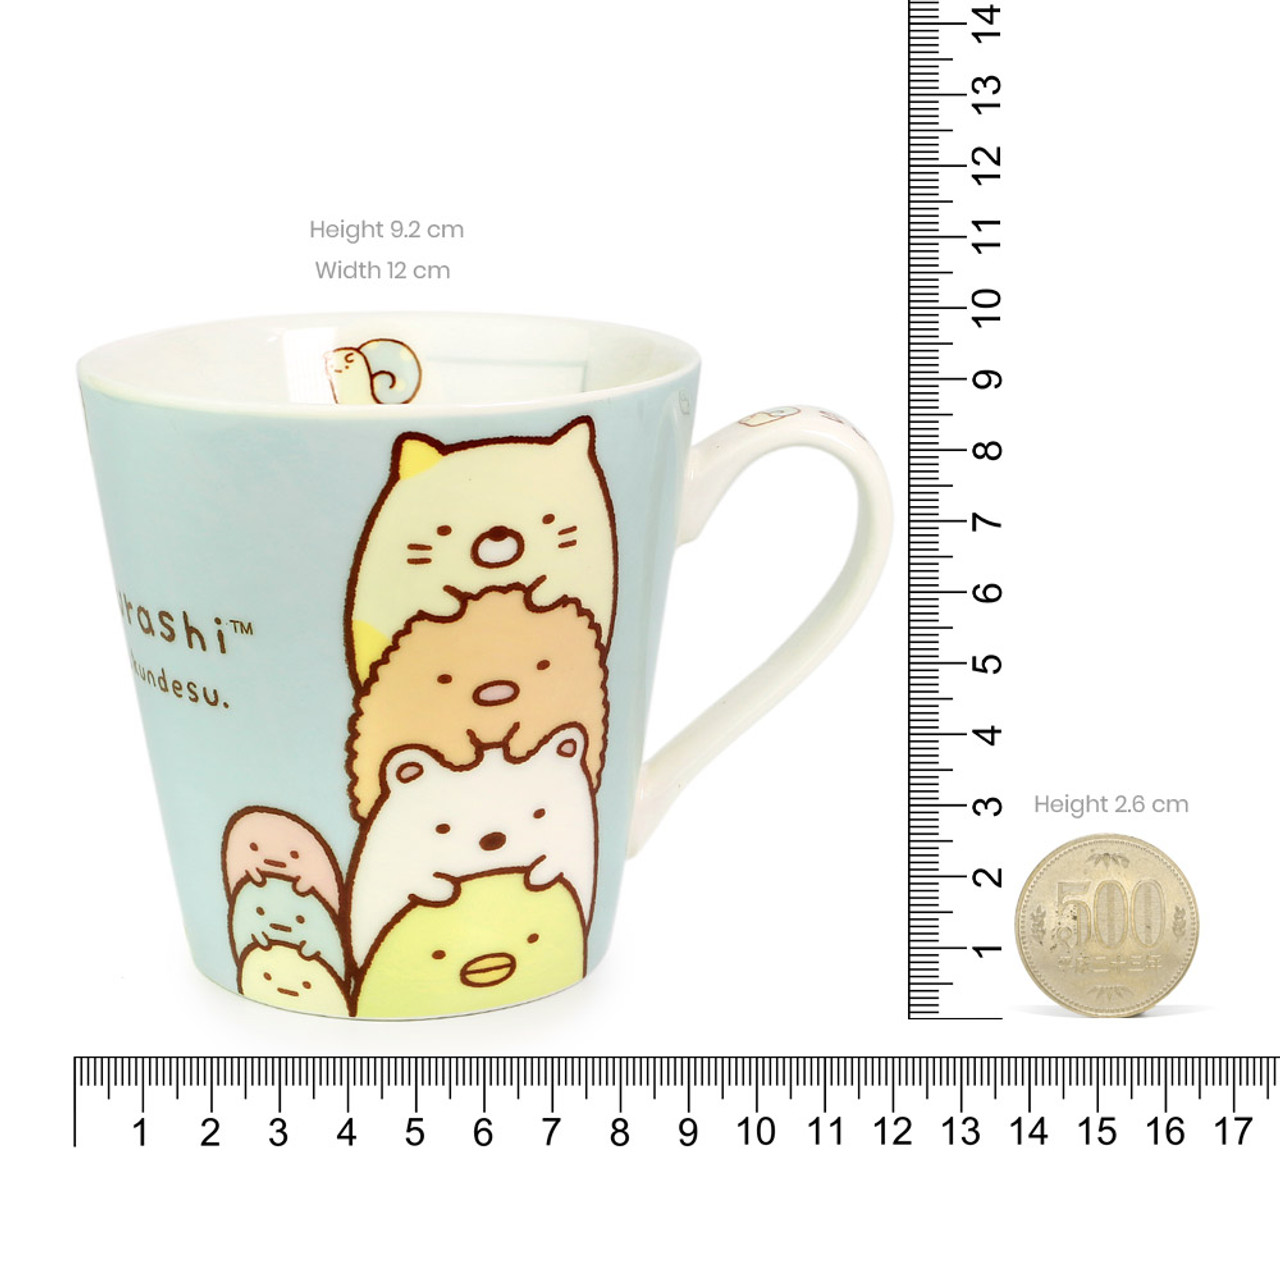 Sumikko Gurashi Measure Ceramic Cup - Vertical ( Proportion )